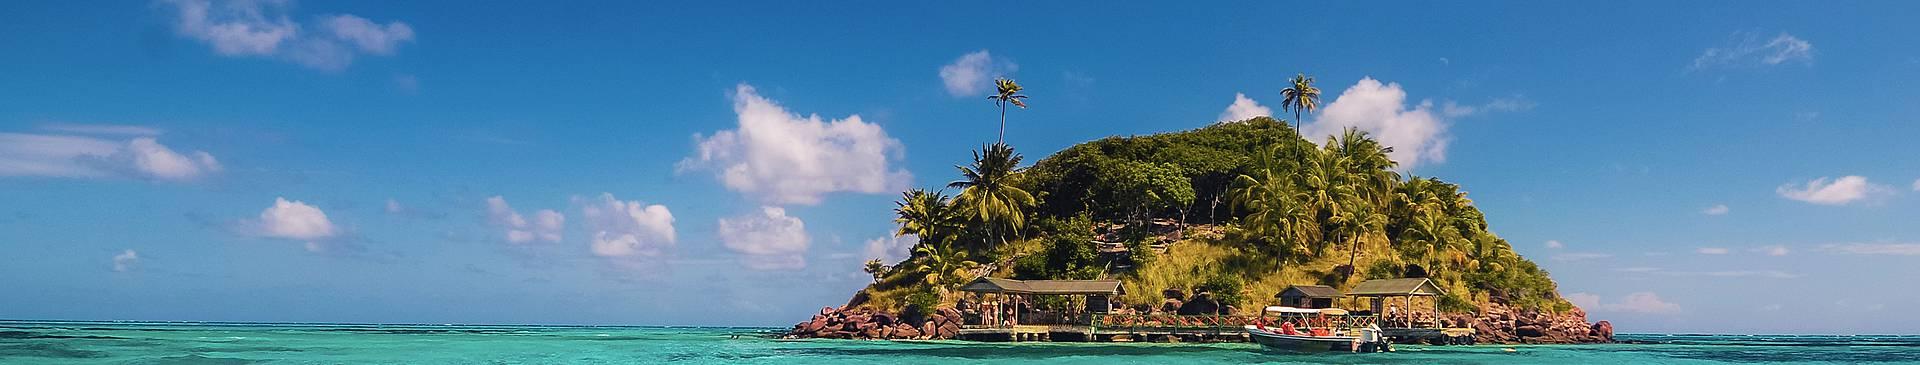 Columbia islands